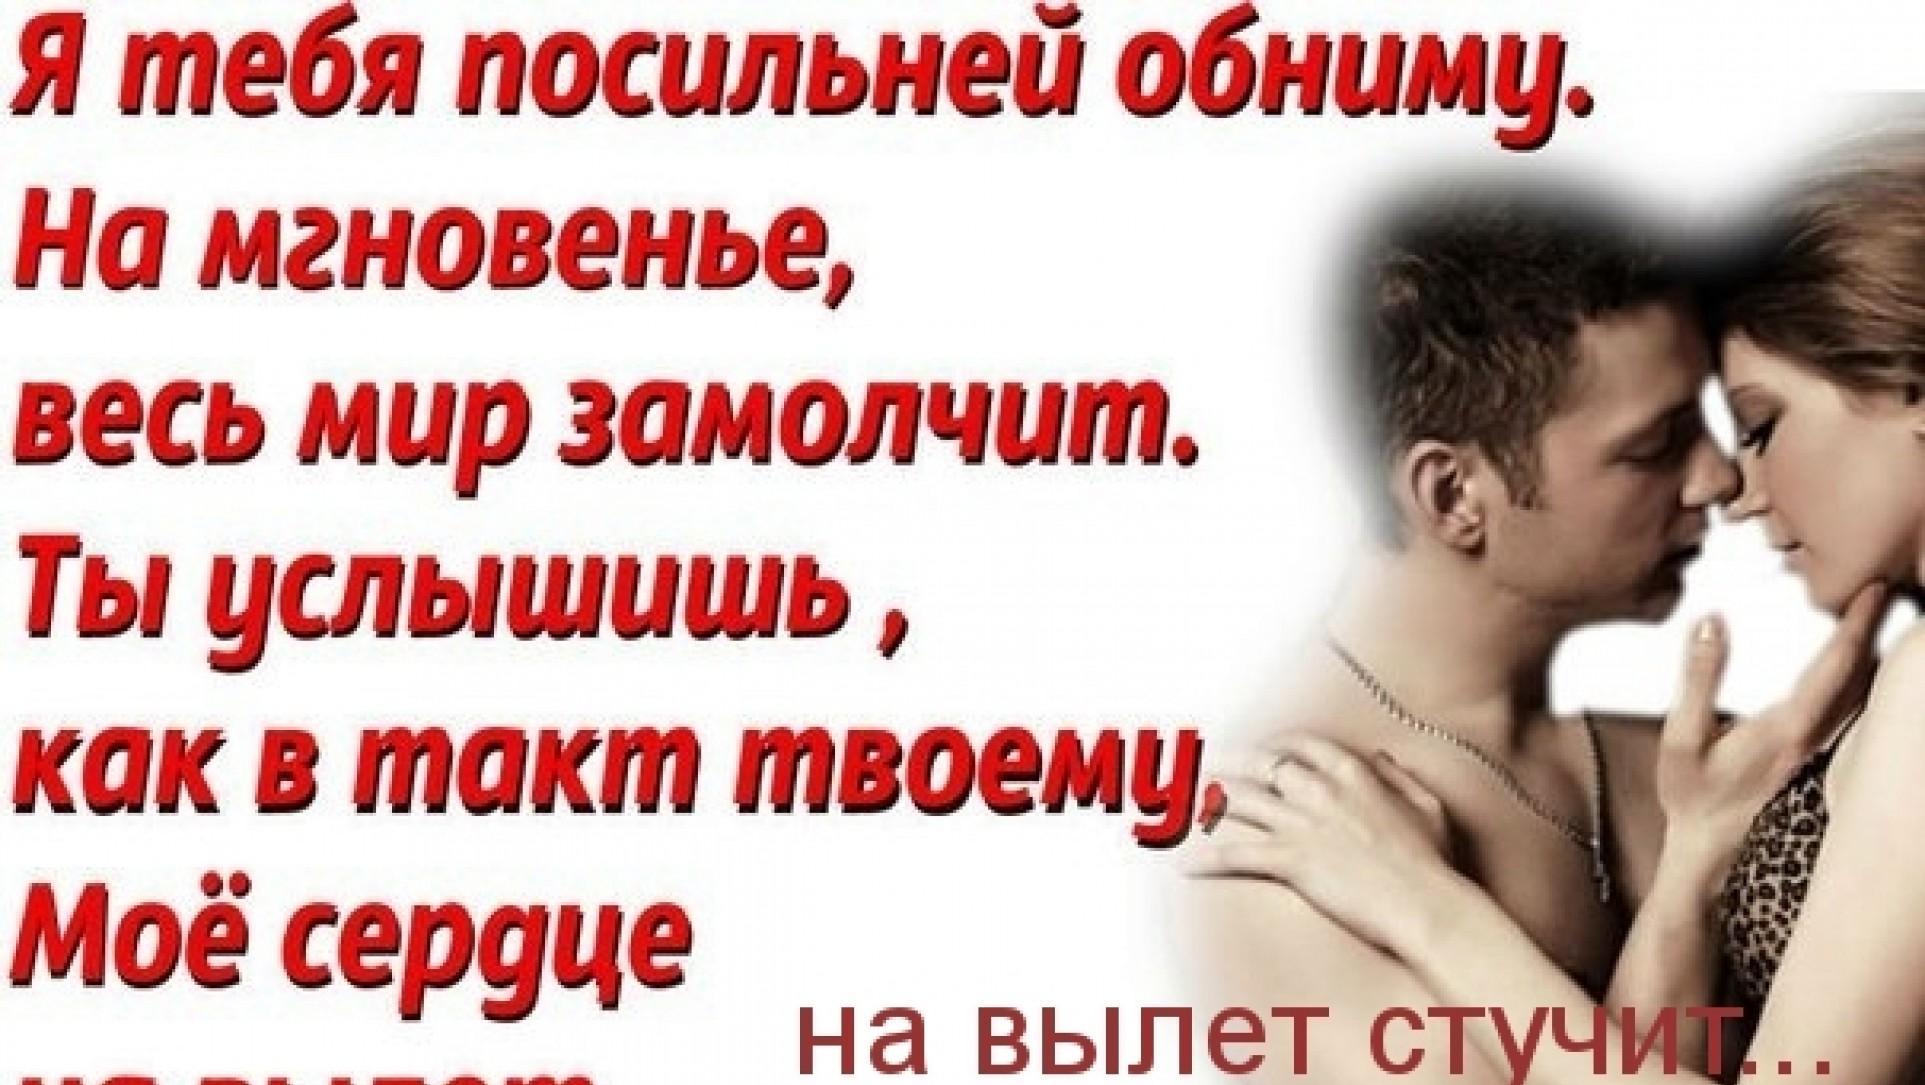 Открытки любимому мужчине обнимаю тебя, надписями